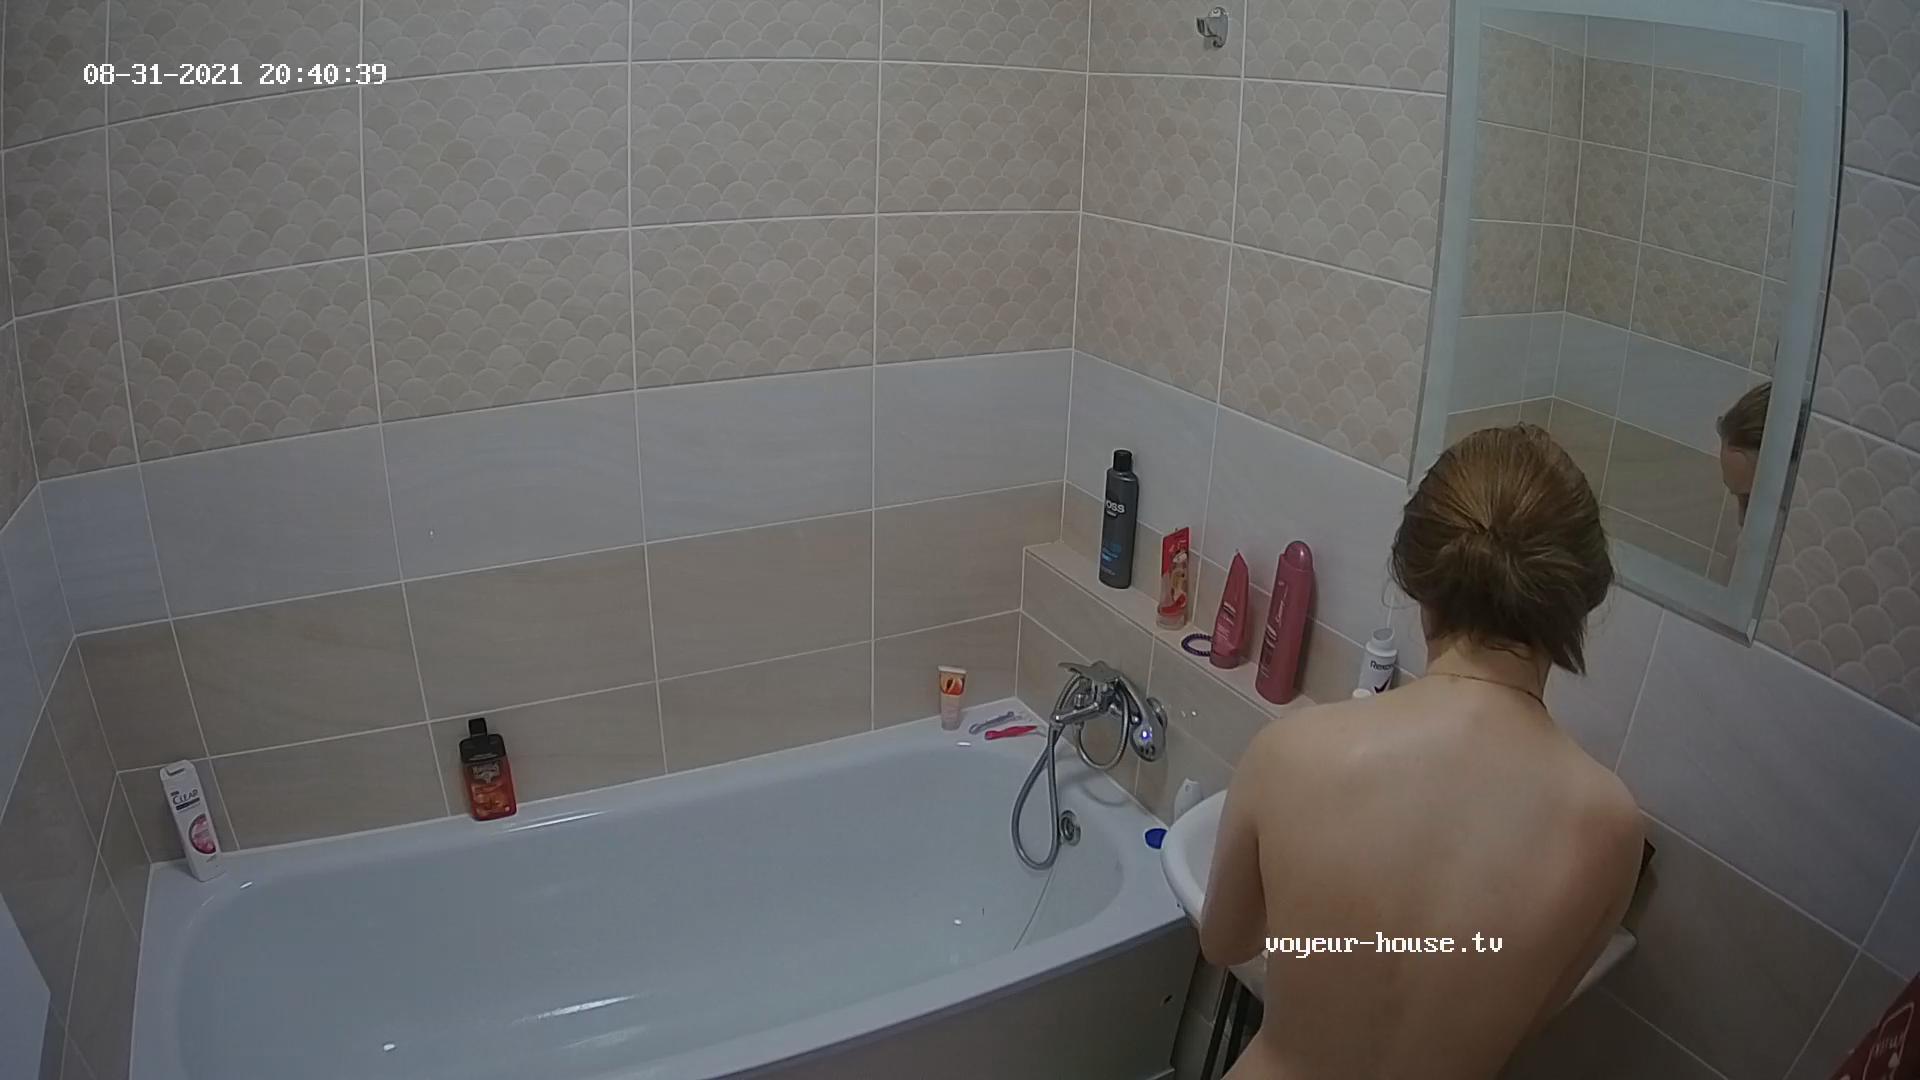 Katia takes a bath and shaves Aug31 21